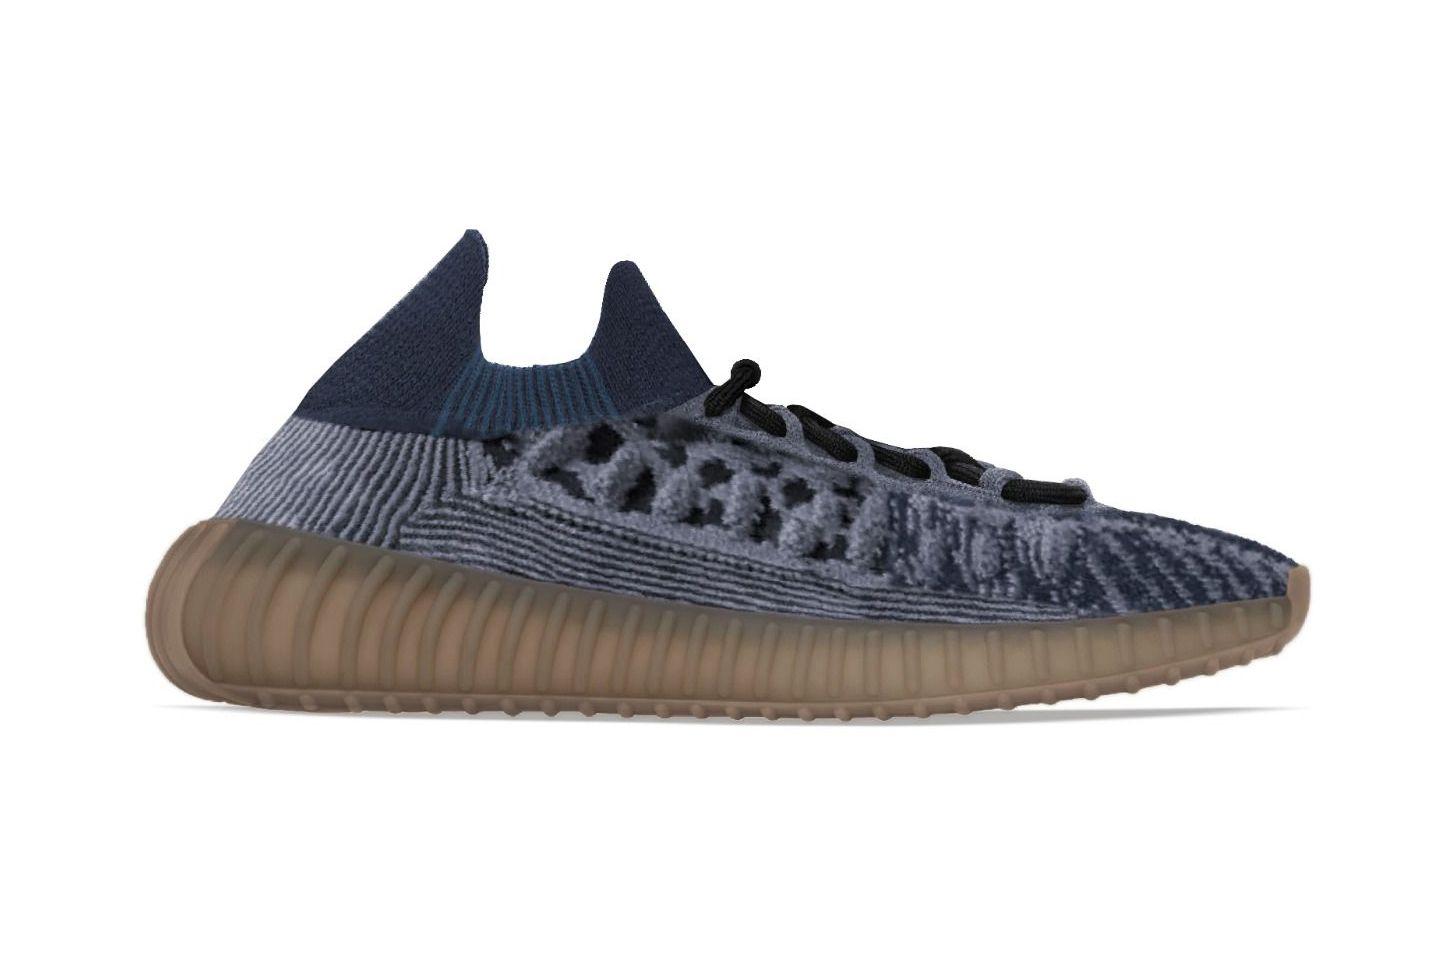 adidas Yeezy Boost 350 V2 CMPCT 'Slate Blue'